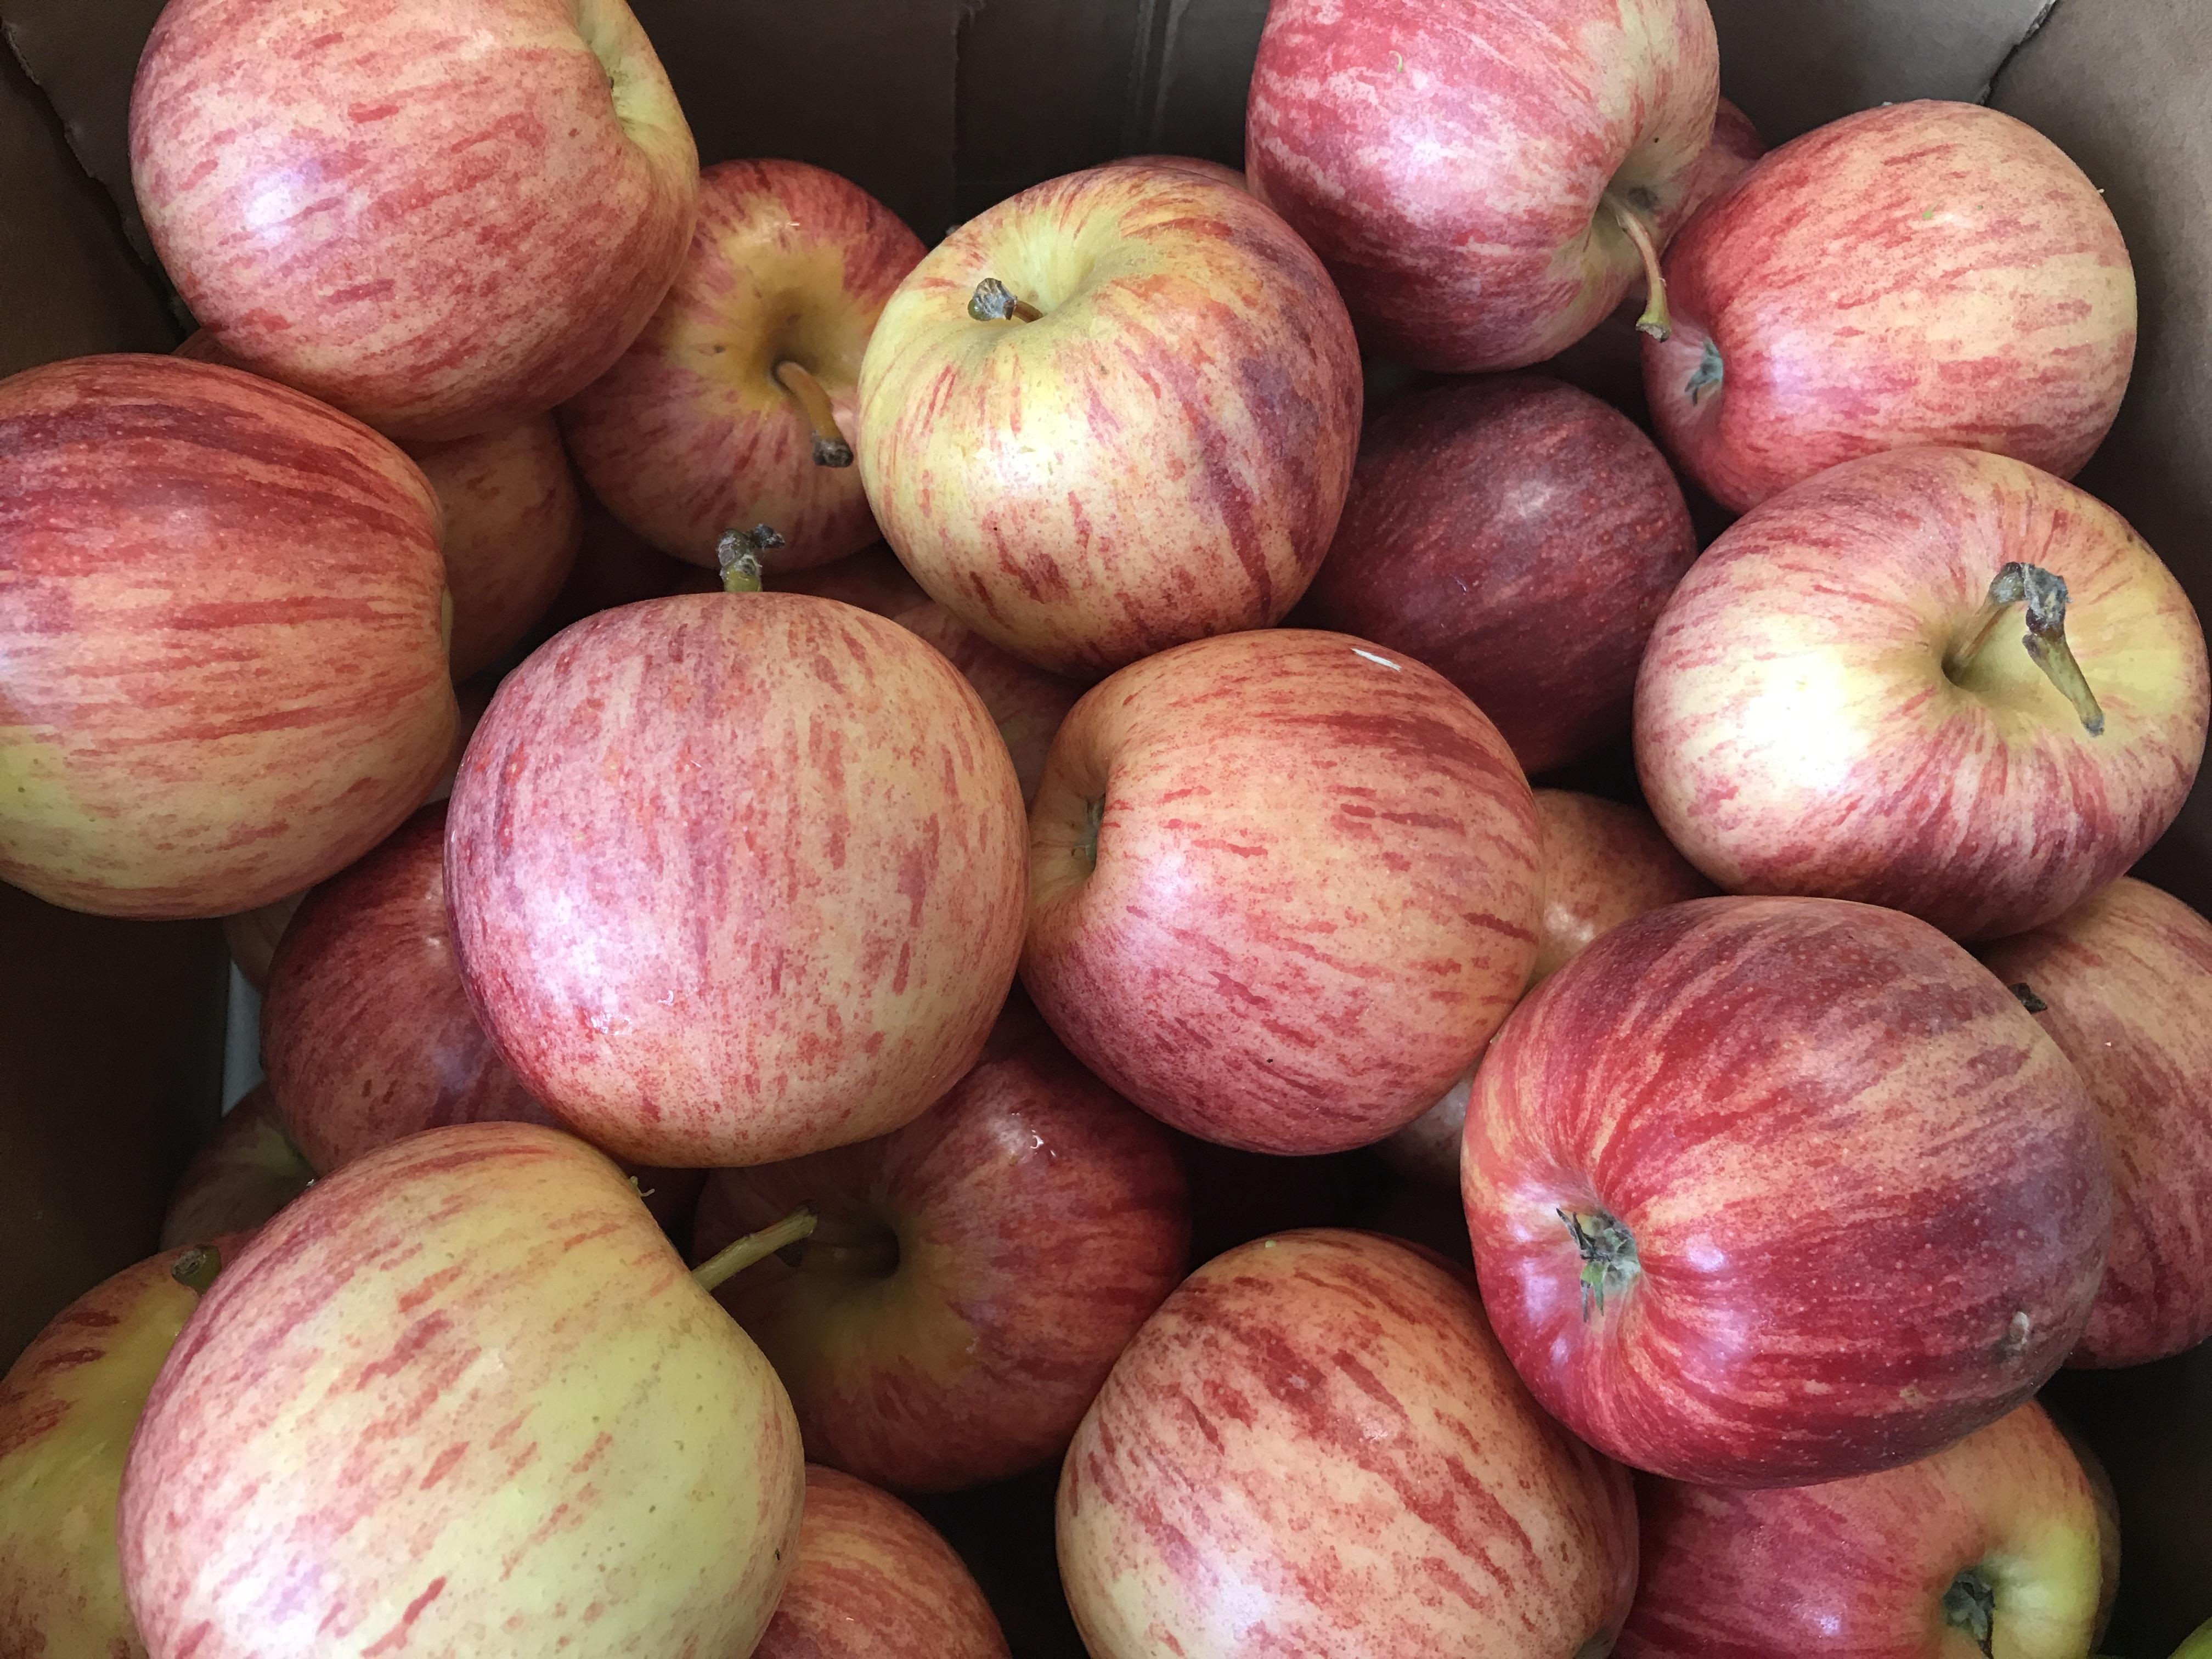 Organic Apples - Braeburn